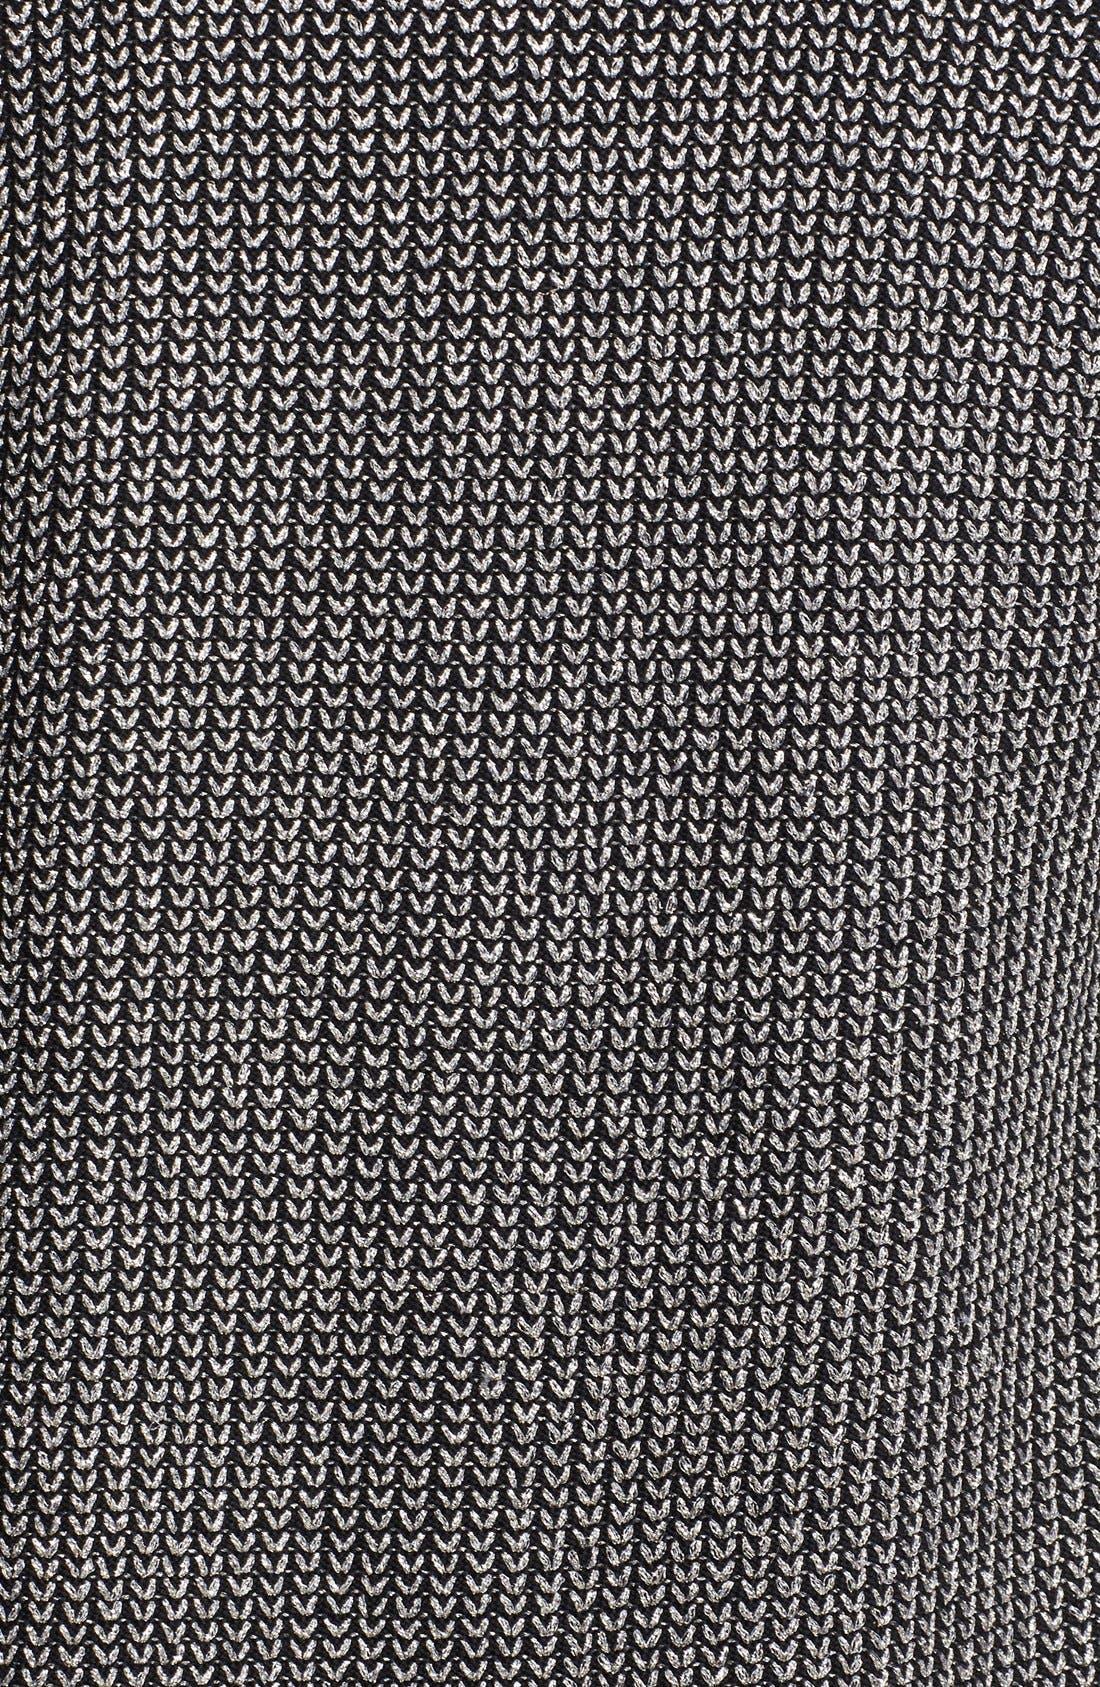 Alternate Image 3  - St. John Collection Lace Trim Metallic Micro Knit Jacket